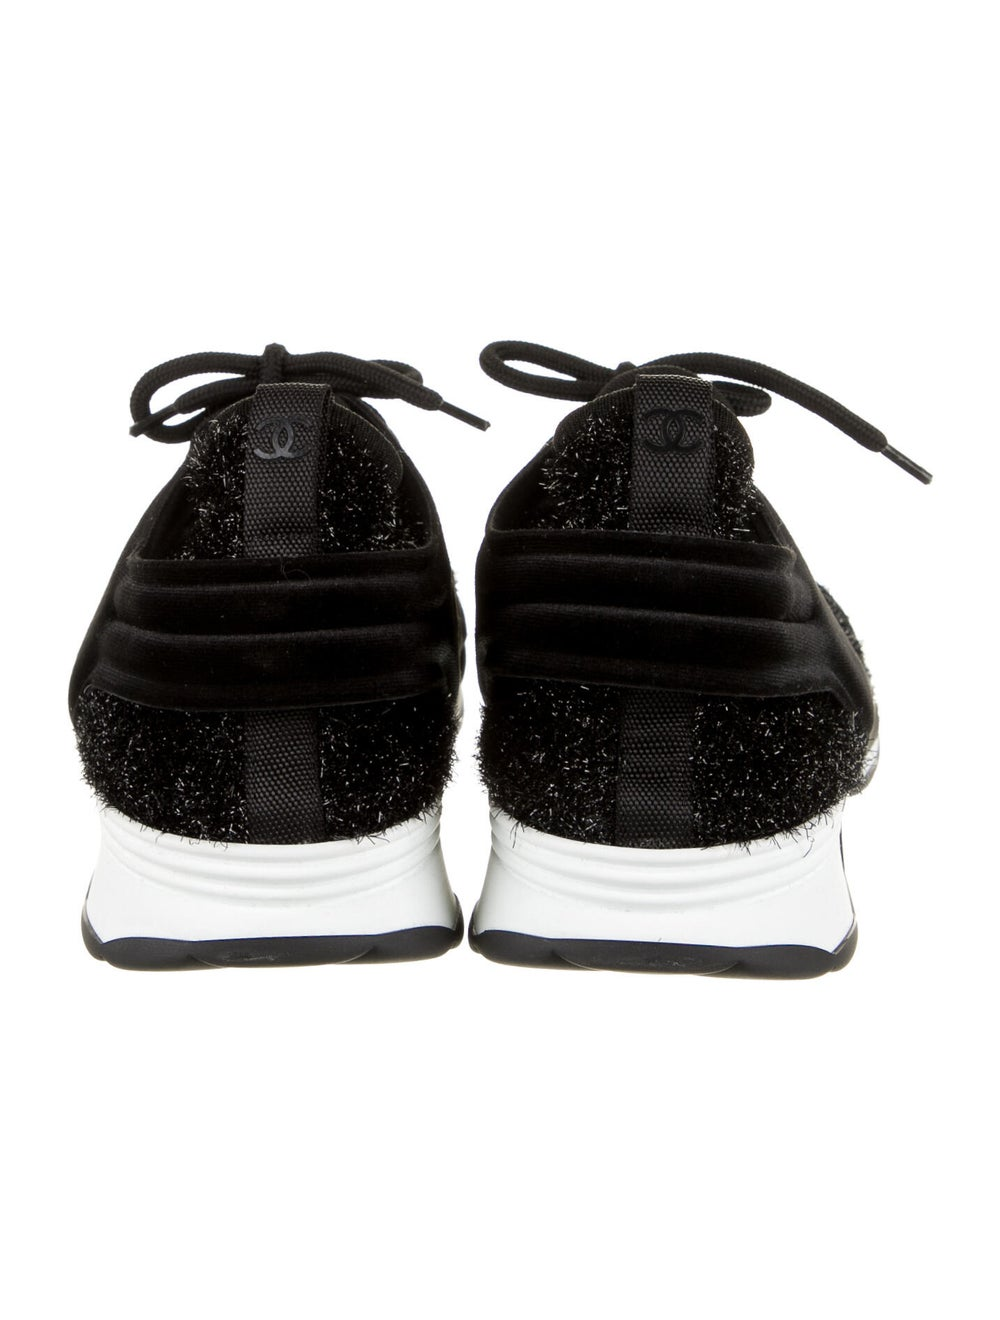 Chanel Tinsel Sock Sneakers Sneakers Black - image 4